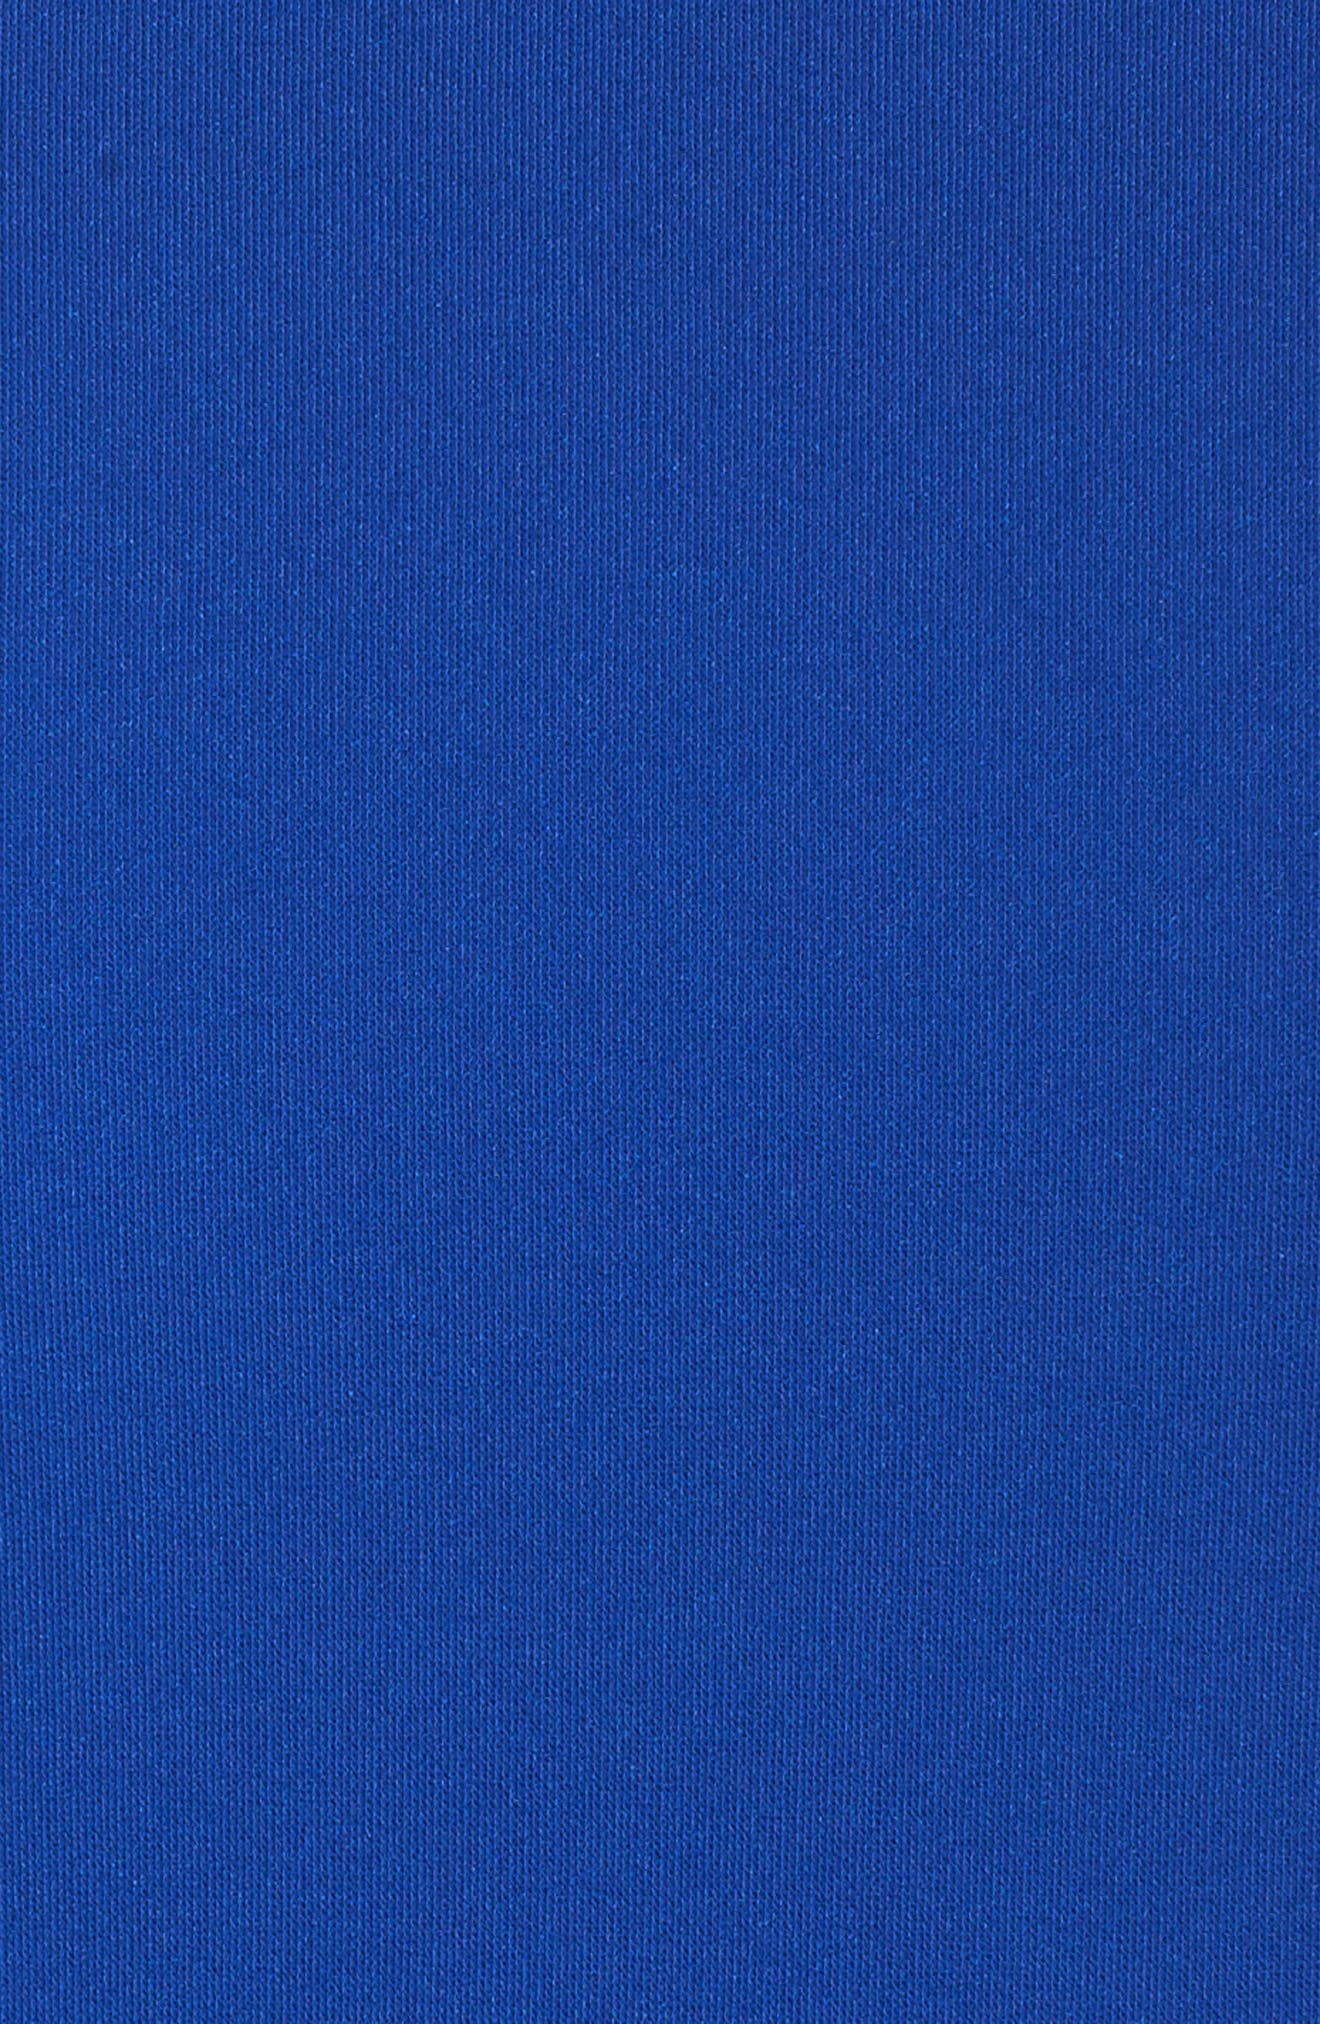 Cold Shoulder Sheath Dress,                             Alternate thumbnail 5, color,                             Cobalt